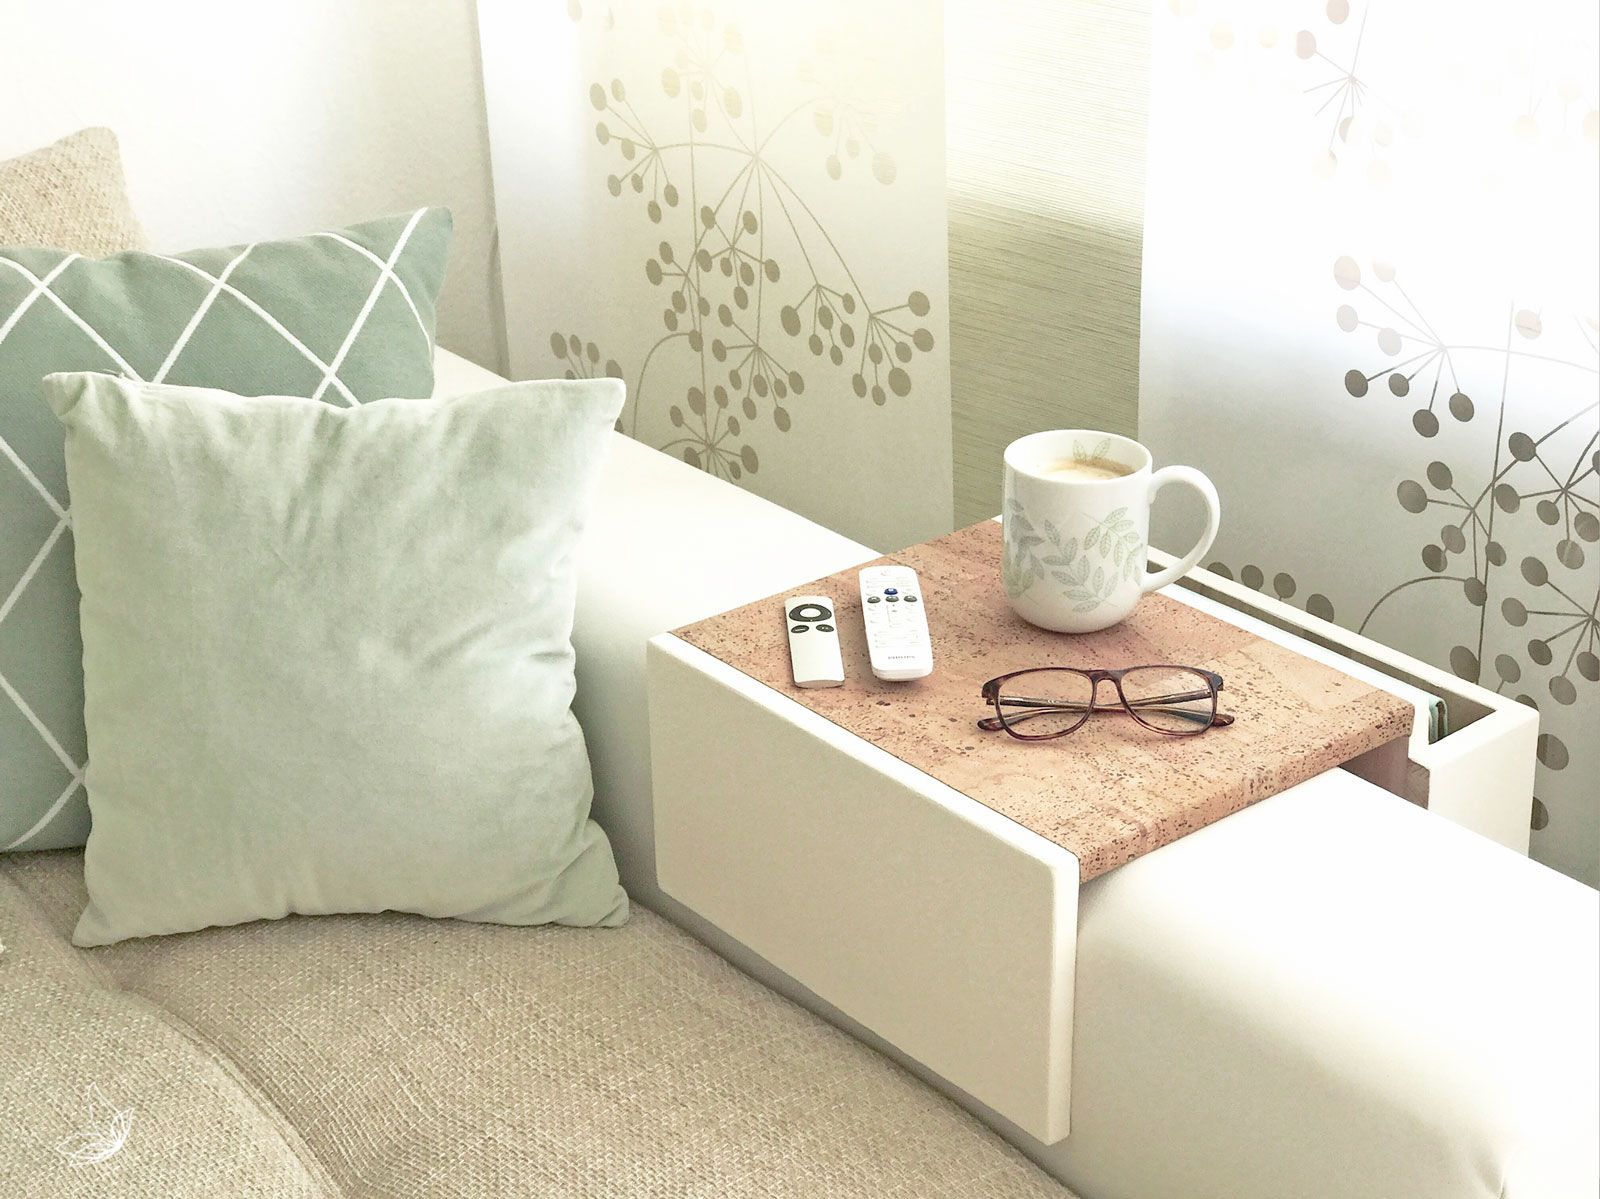 do it yourself sofa tablett in kreideweiss mit kork akzenten home decor sofa tablett couch. Black Bedroom Furniture Sets. Home Design Ideas